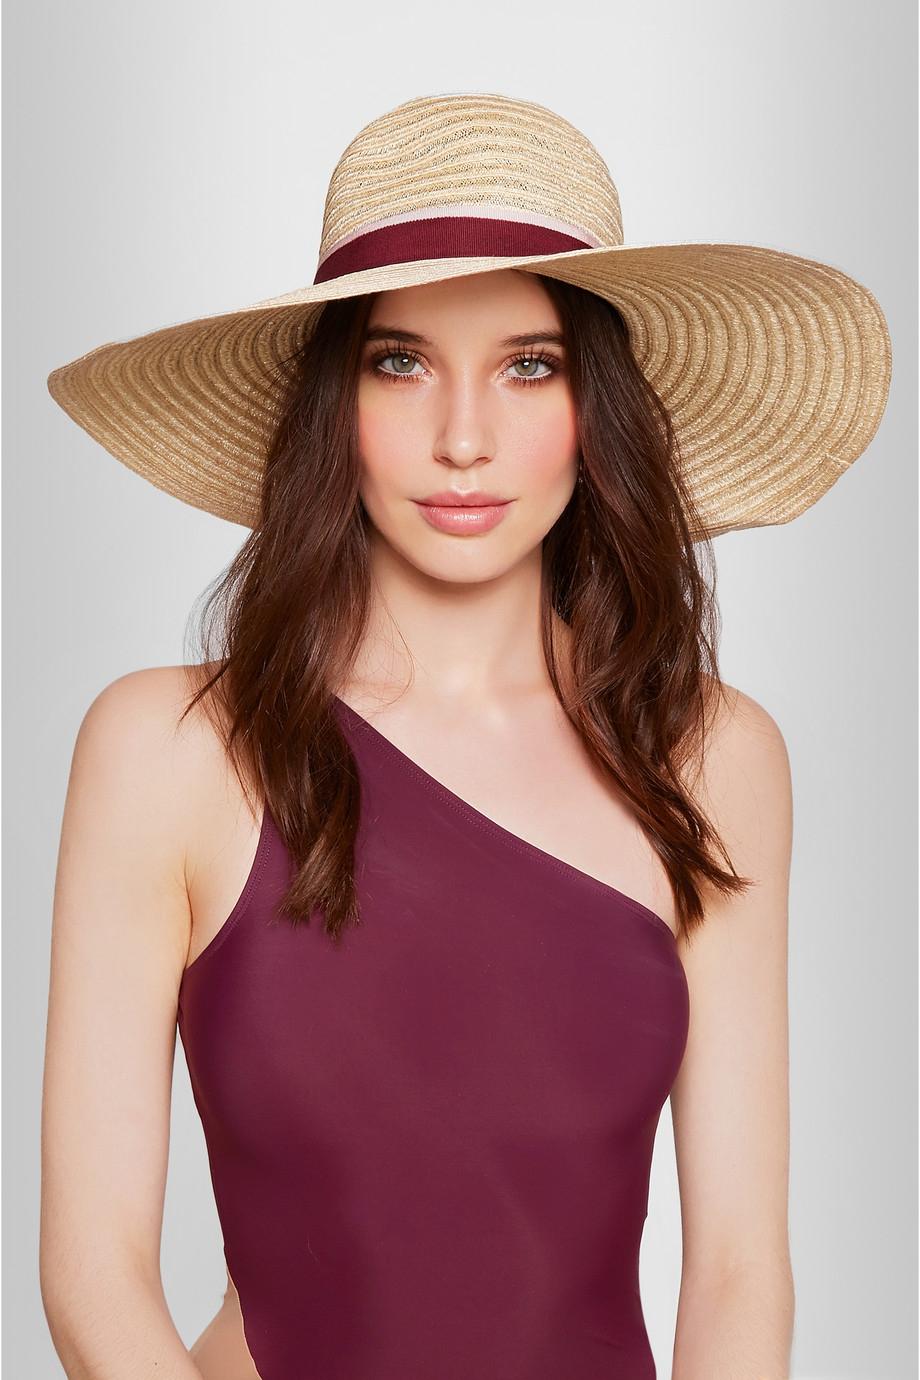 Maison michel blanche wide brim straw hat in natural lyst for Maison michel